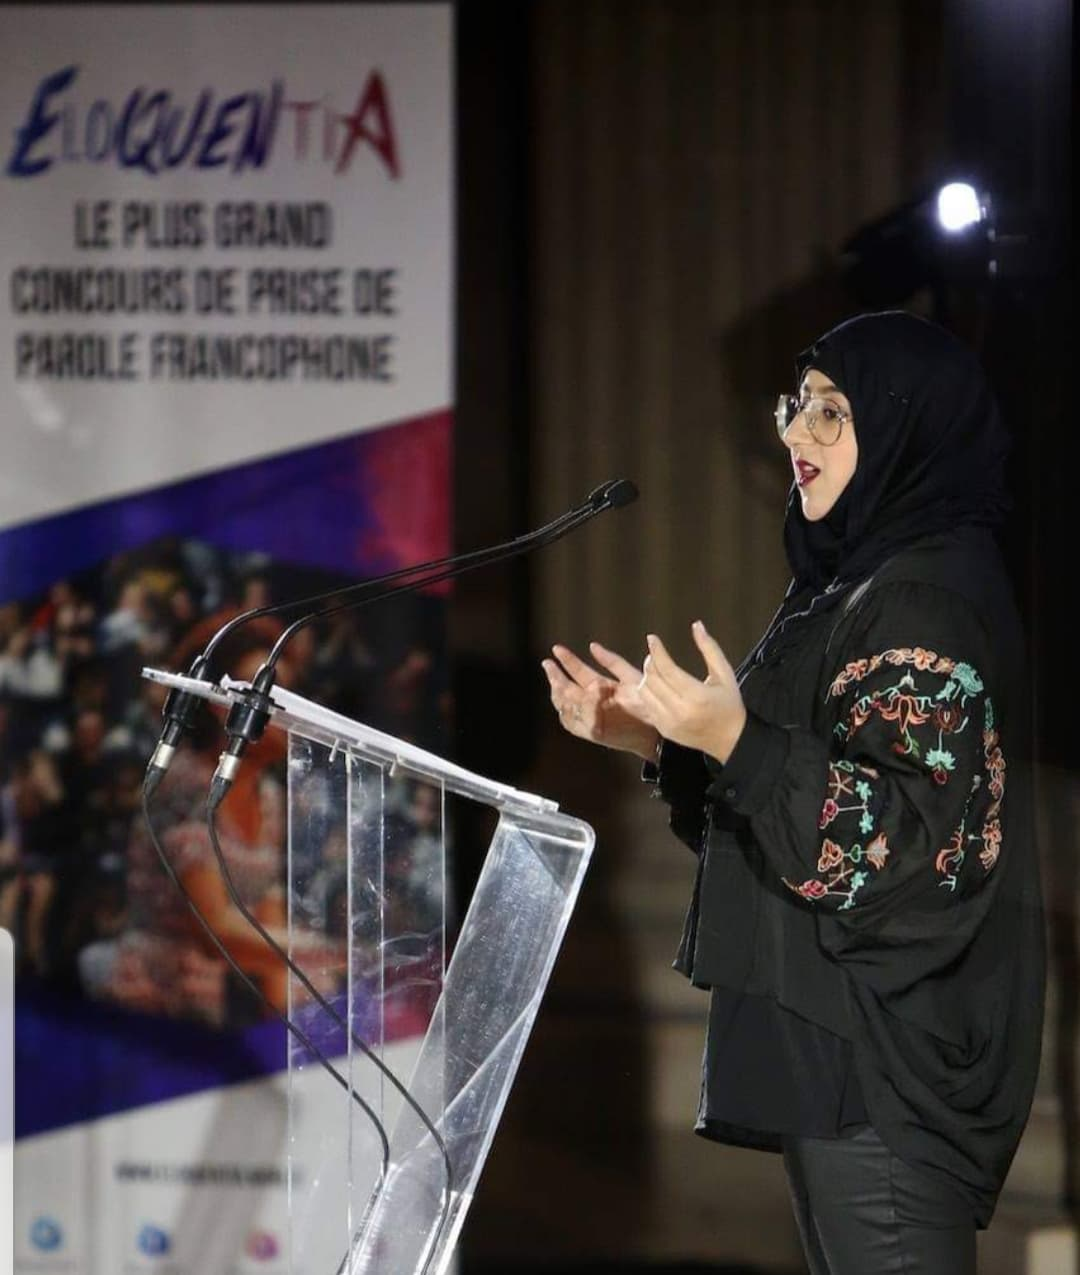 Nour Benyounes_choofmedia